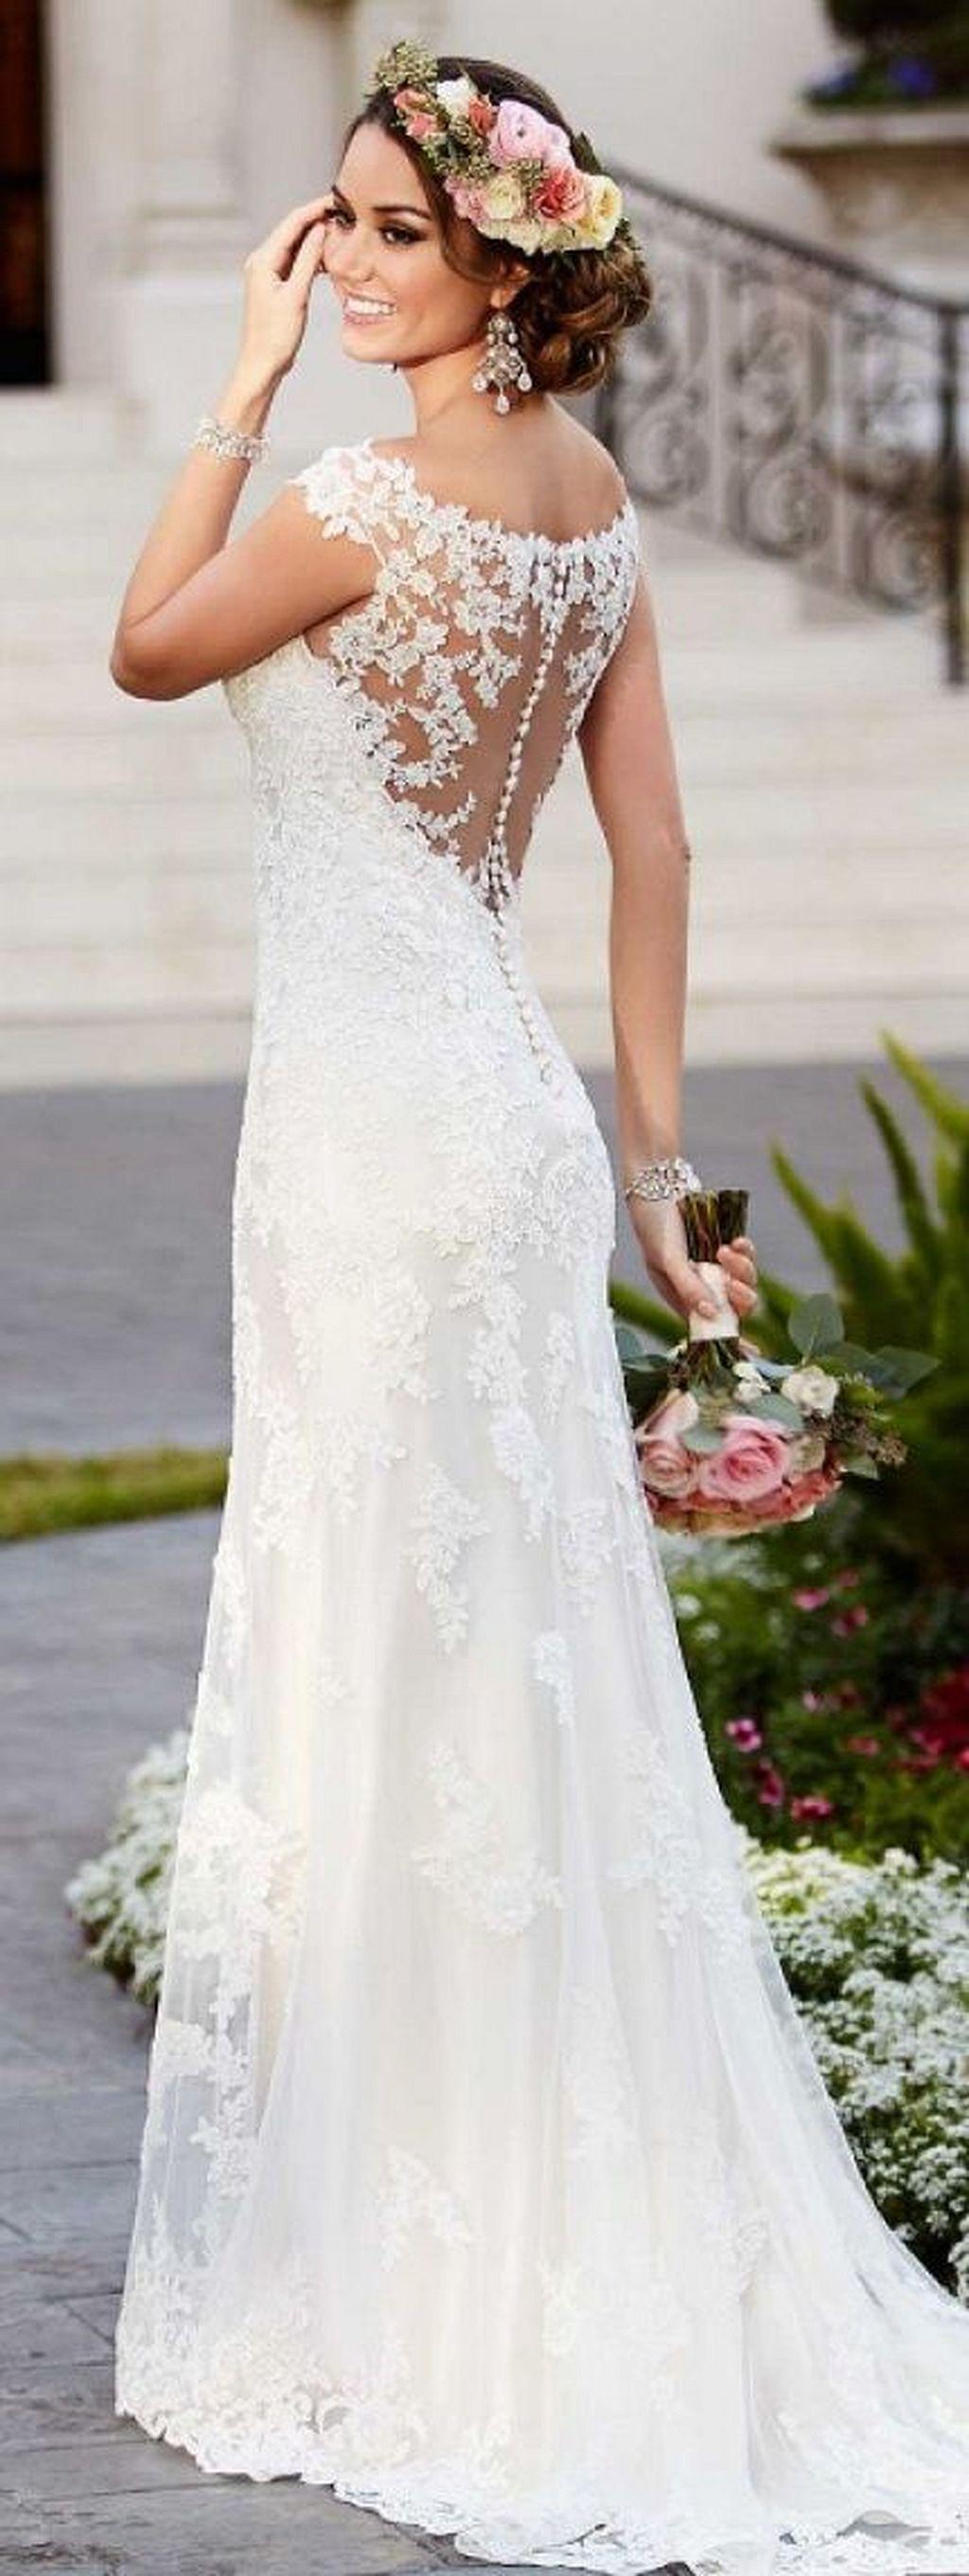 gorgeous lace wedding dresses ideas dress ideas lace wedding